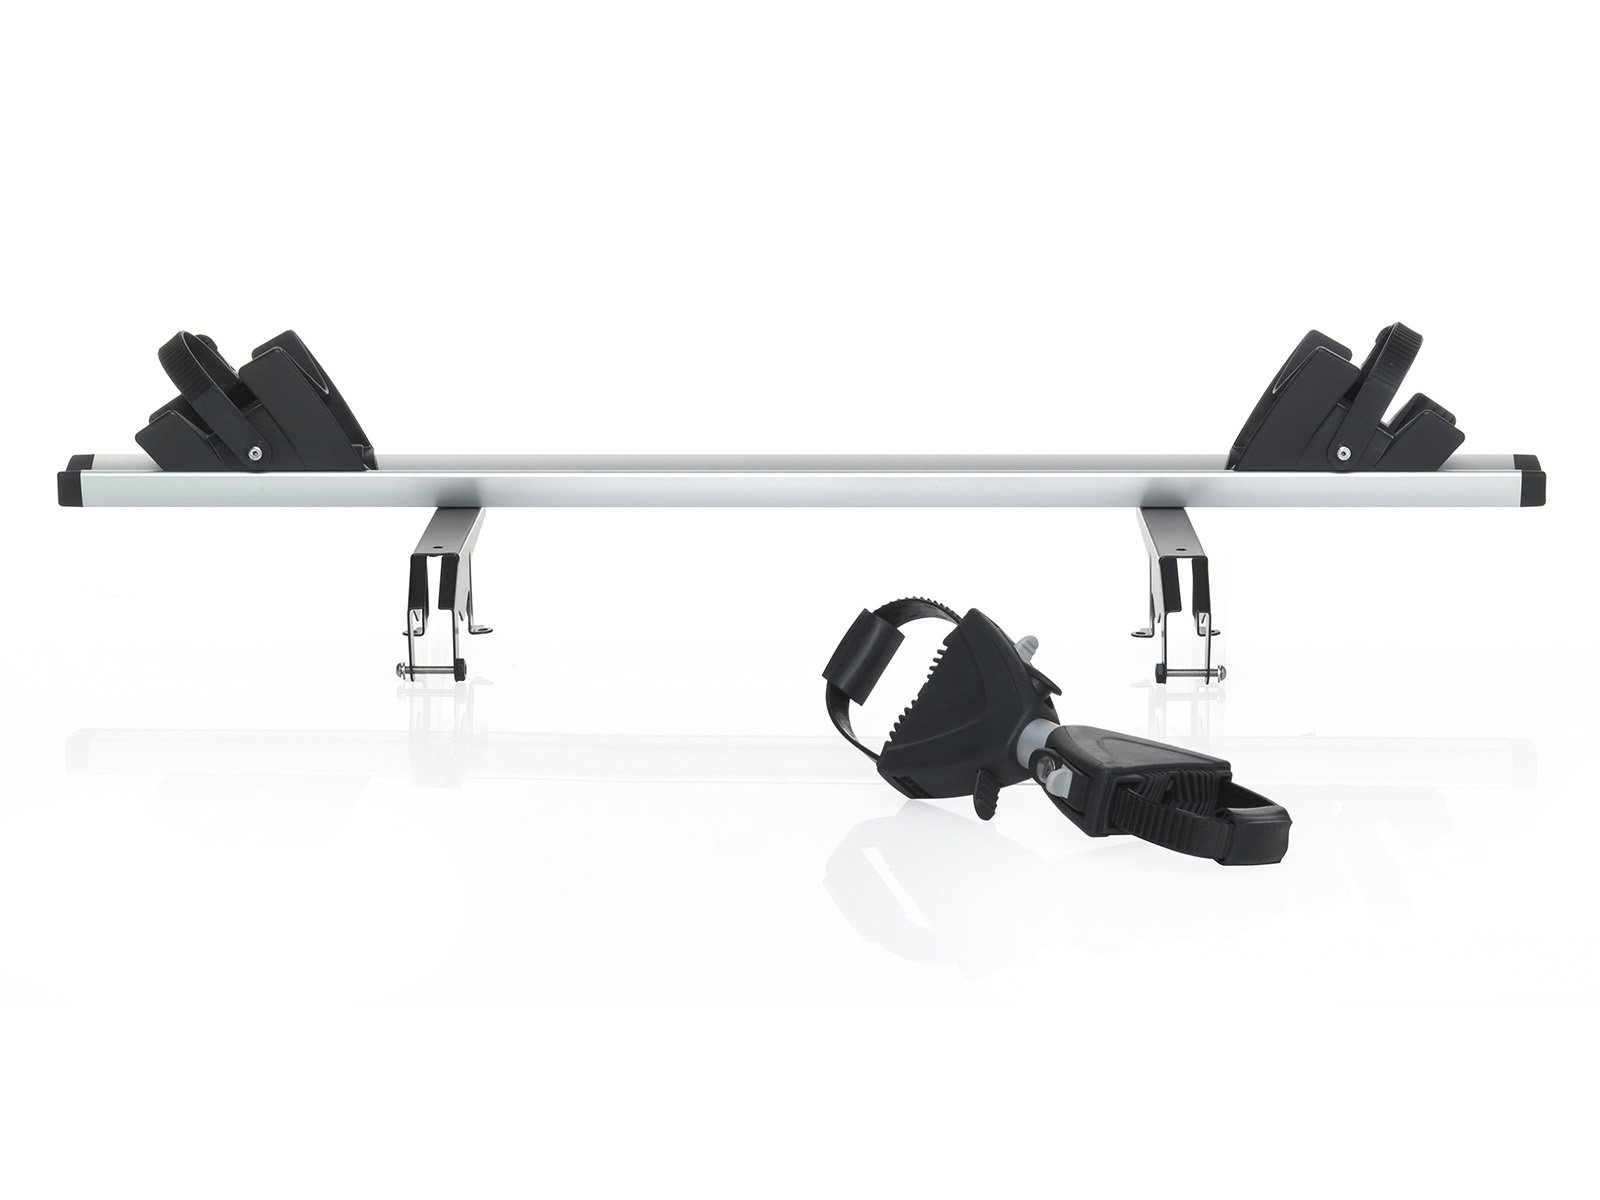 strada sport m2 atera strada sport m3 adapter na 3 4. Black Bedroom Furniture Sets. Home Design Ideas